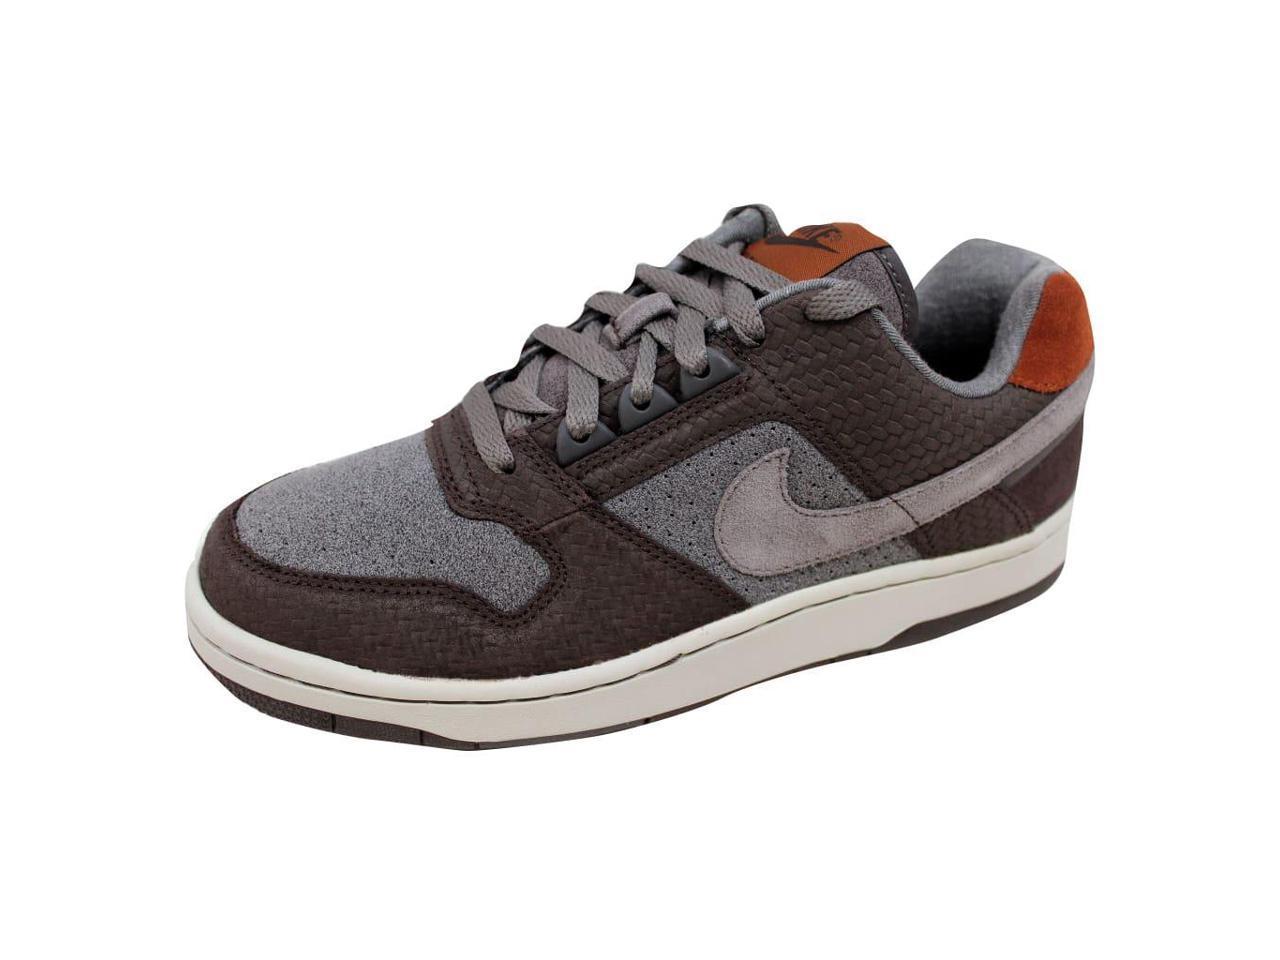 Nike Men's Delta Force Grey-Midnight A Low Dark Cinder/Soft Grey-Midnight Force Fog 314167-203 Size 8 6c9823